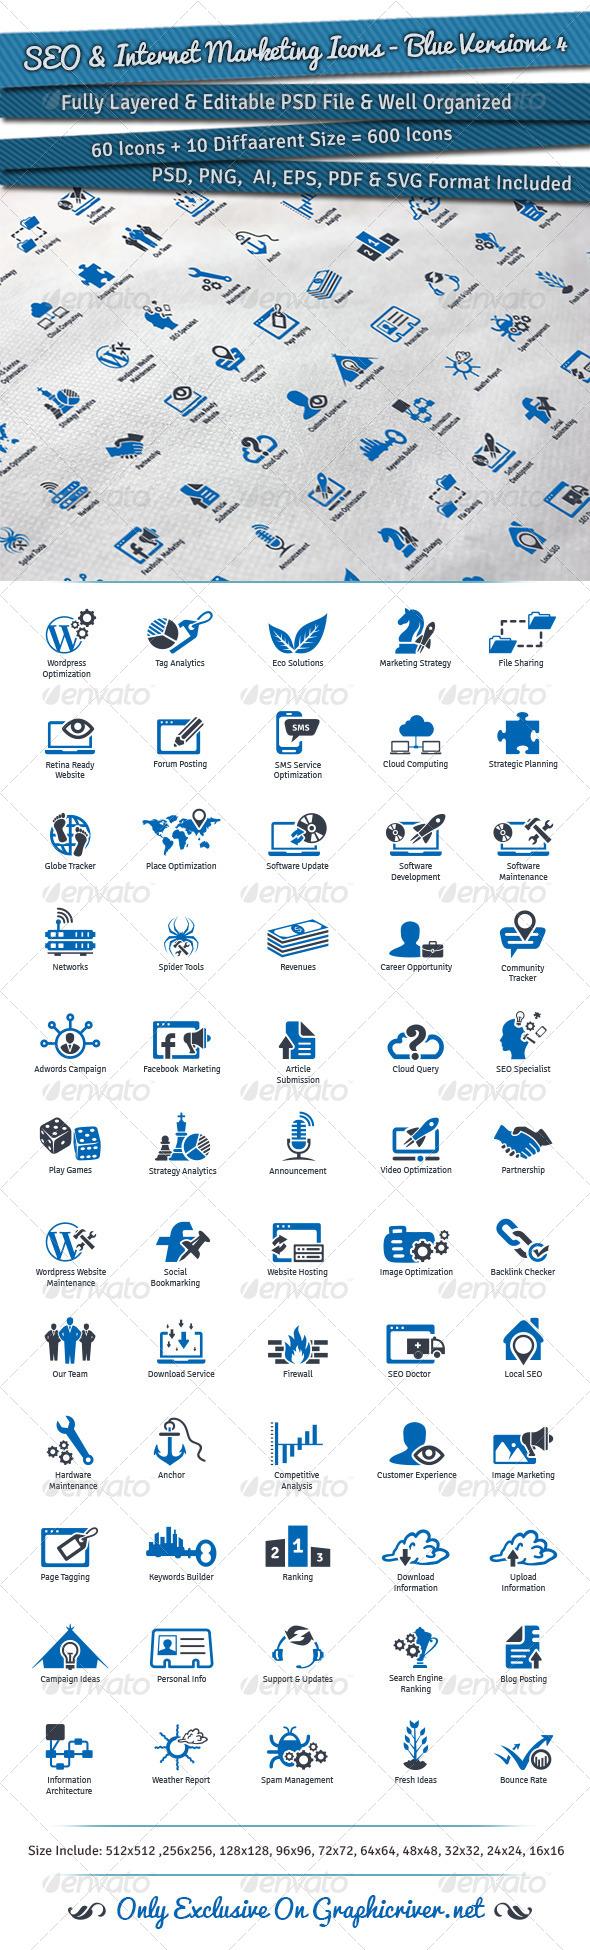 GraphicRiver SEO & Internet Marketing Icons Blue Versions 4 7911697